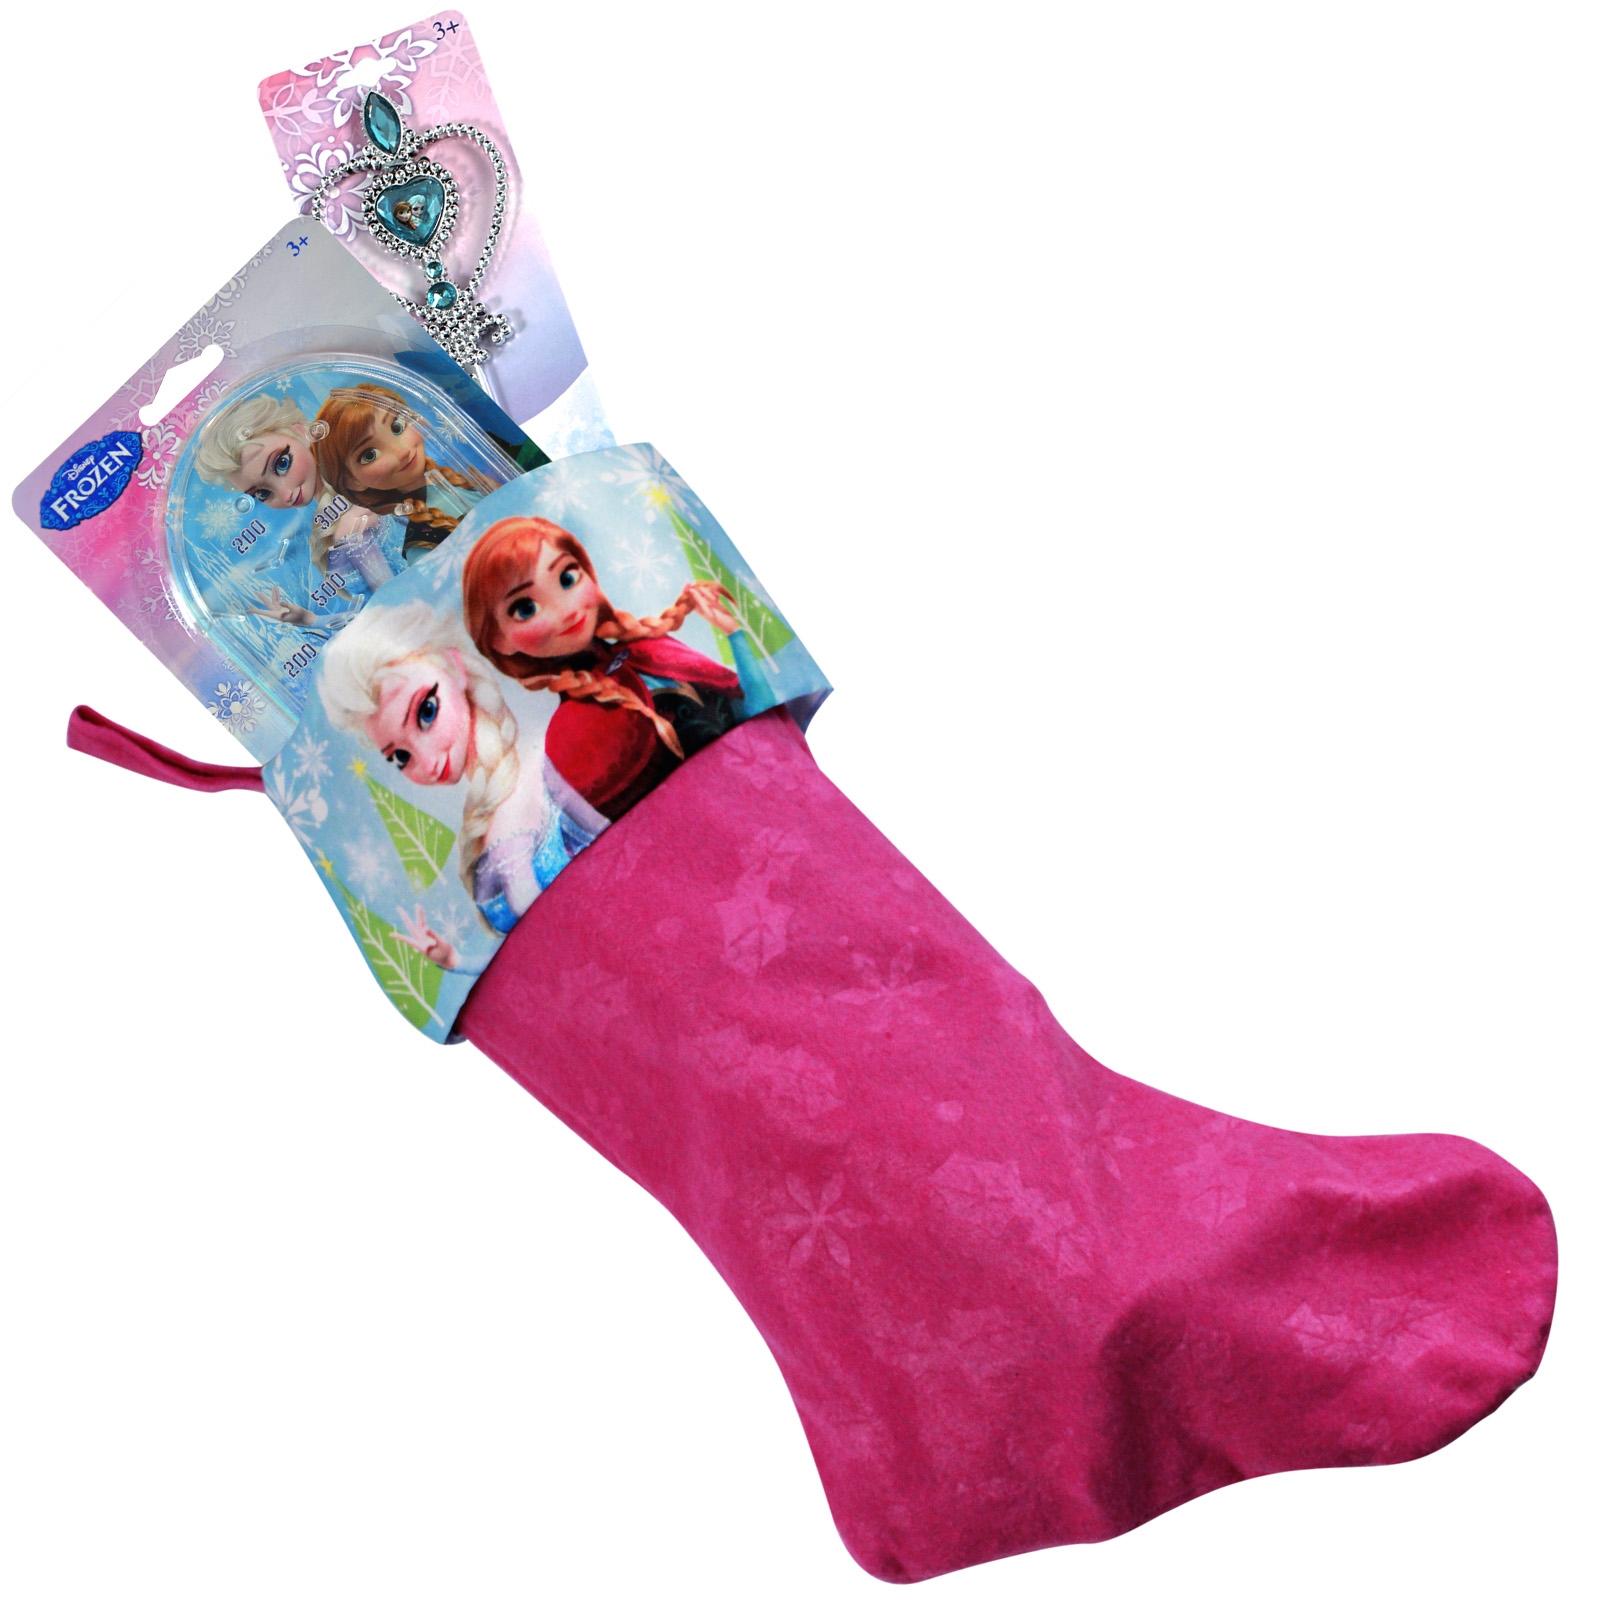 Stocking FIllers with Xmas Stocking Bundle Frozen Movie Disney